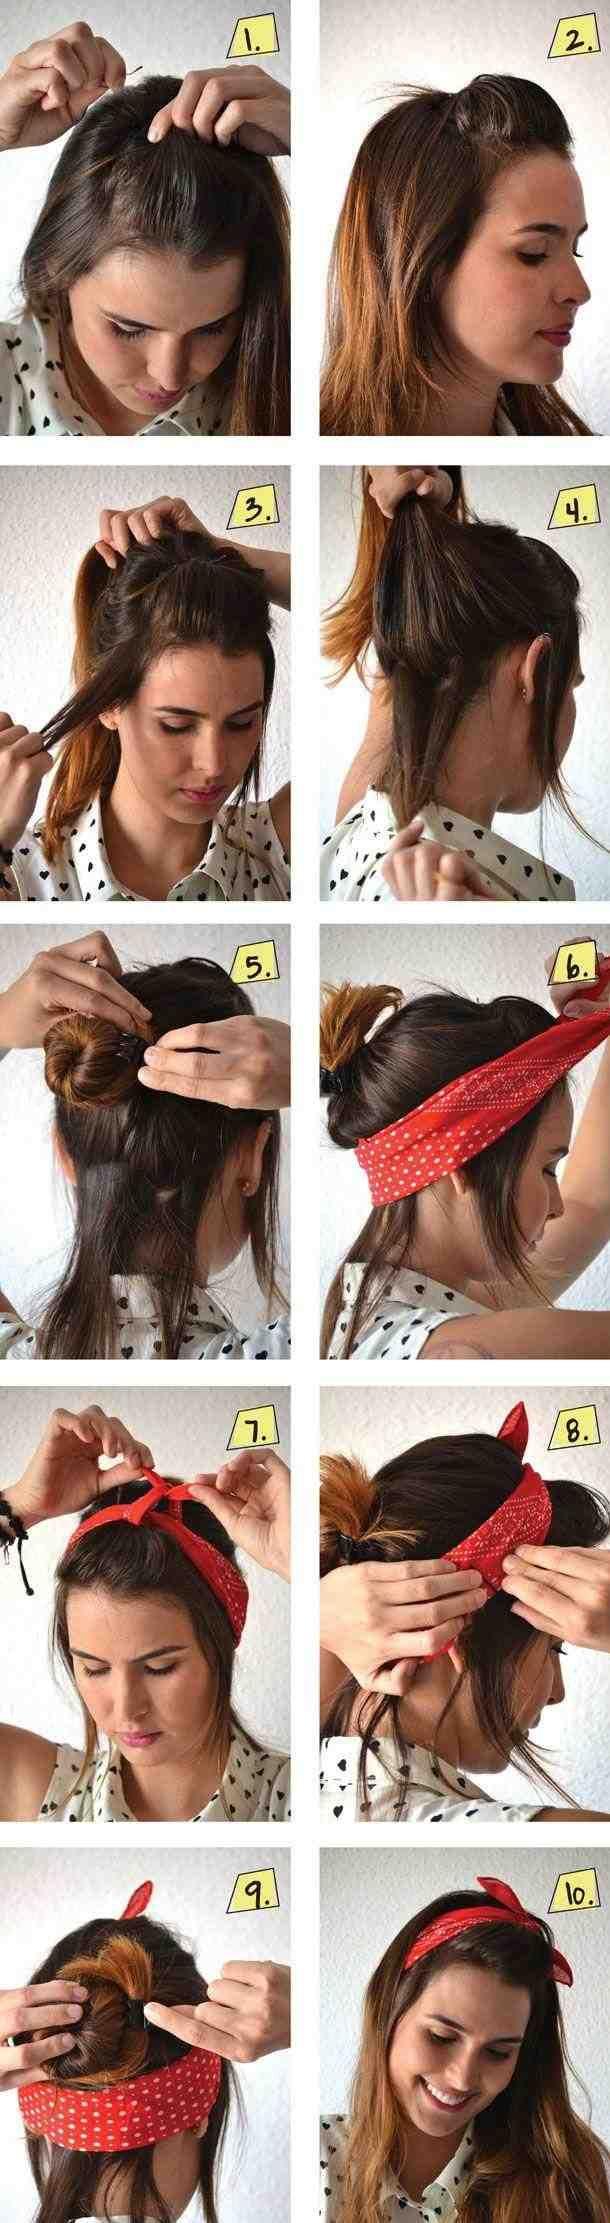 trending 50s hairstyles ideas